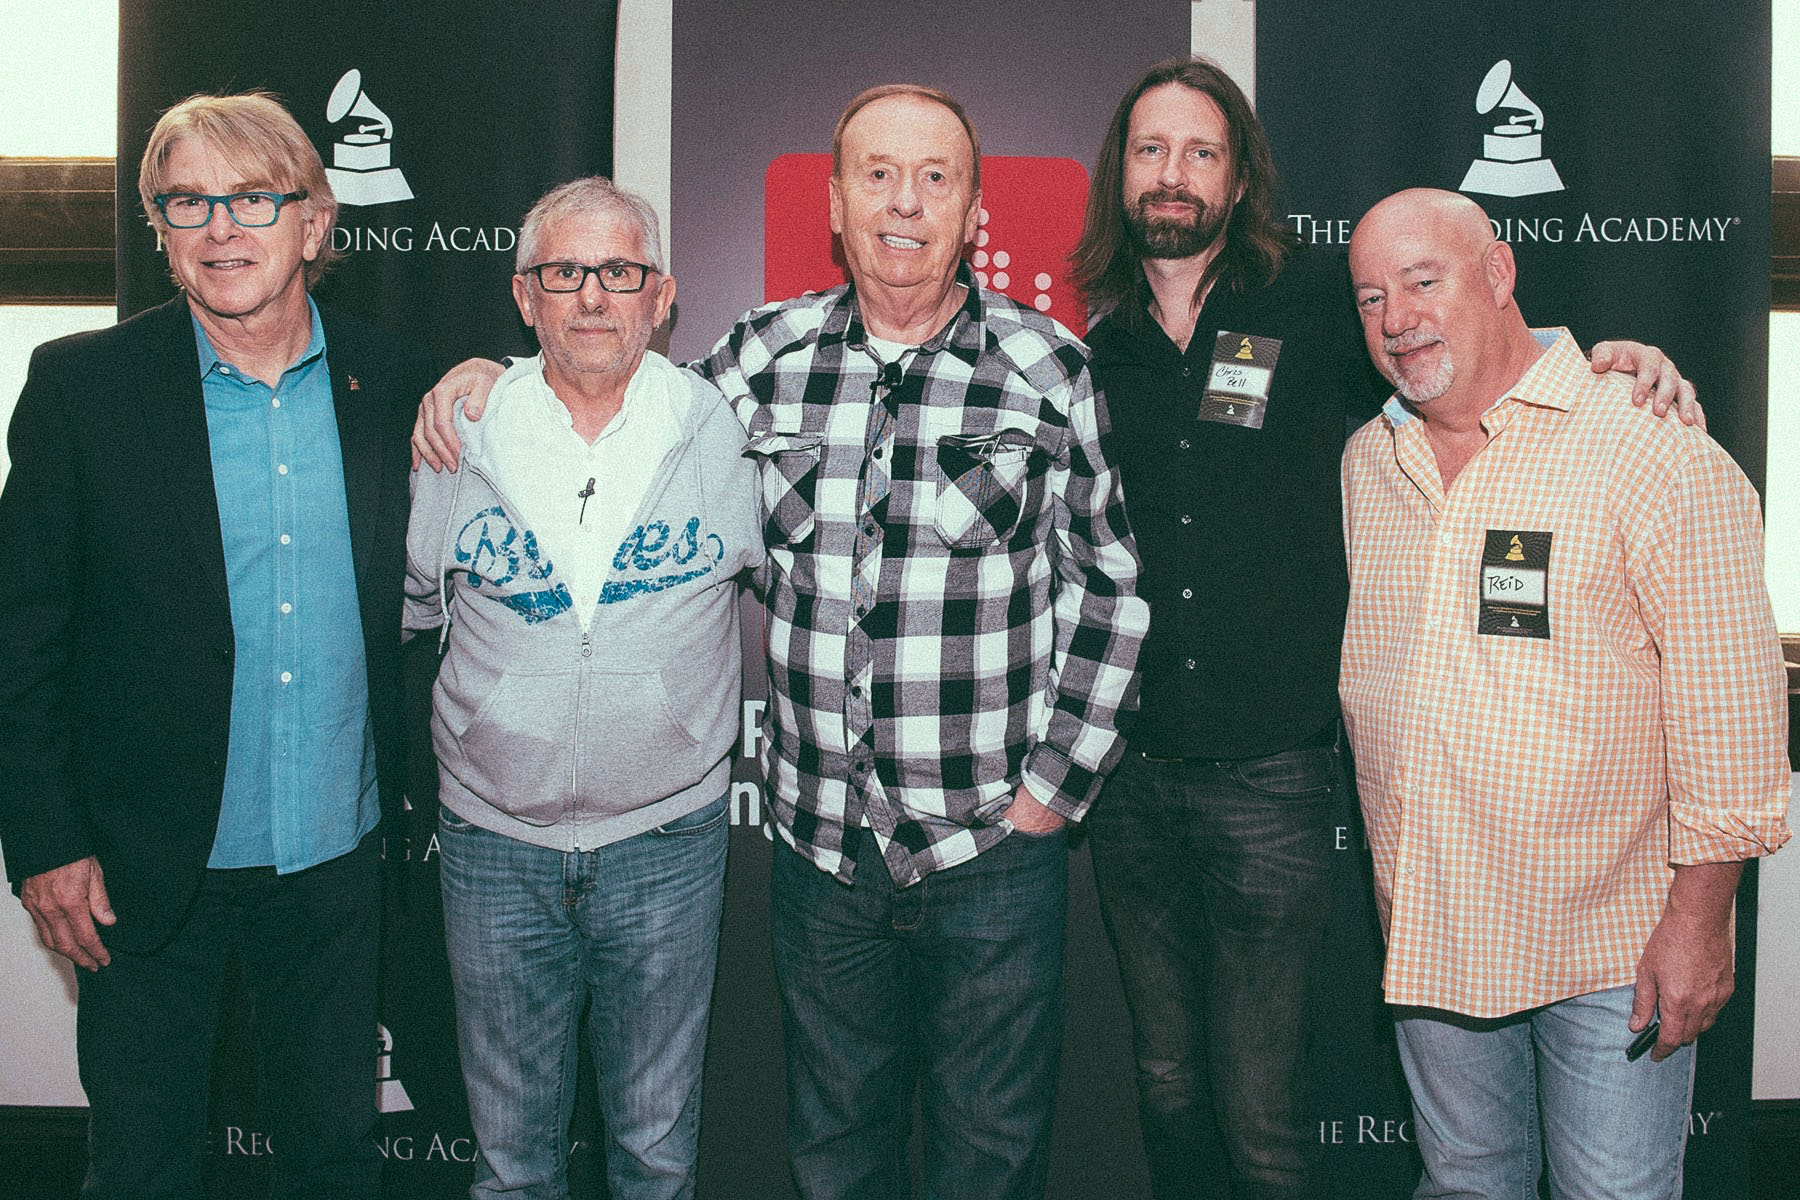 P&E Event with Elliot Scheiner and Goeff Emerick at Esplanade Studios in New Orleans. (Jon Hornyak, Elliot Scheiner, Goeff Emerick, Chris Bell, and Reid Wick)